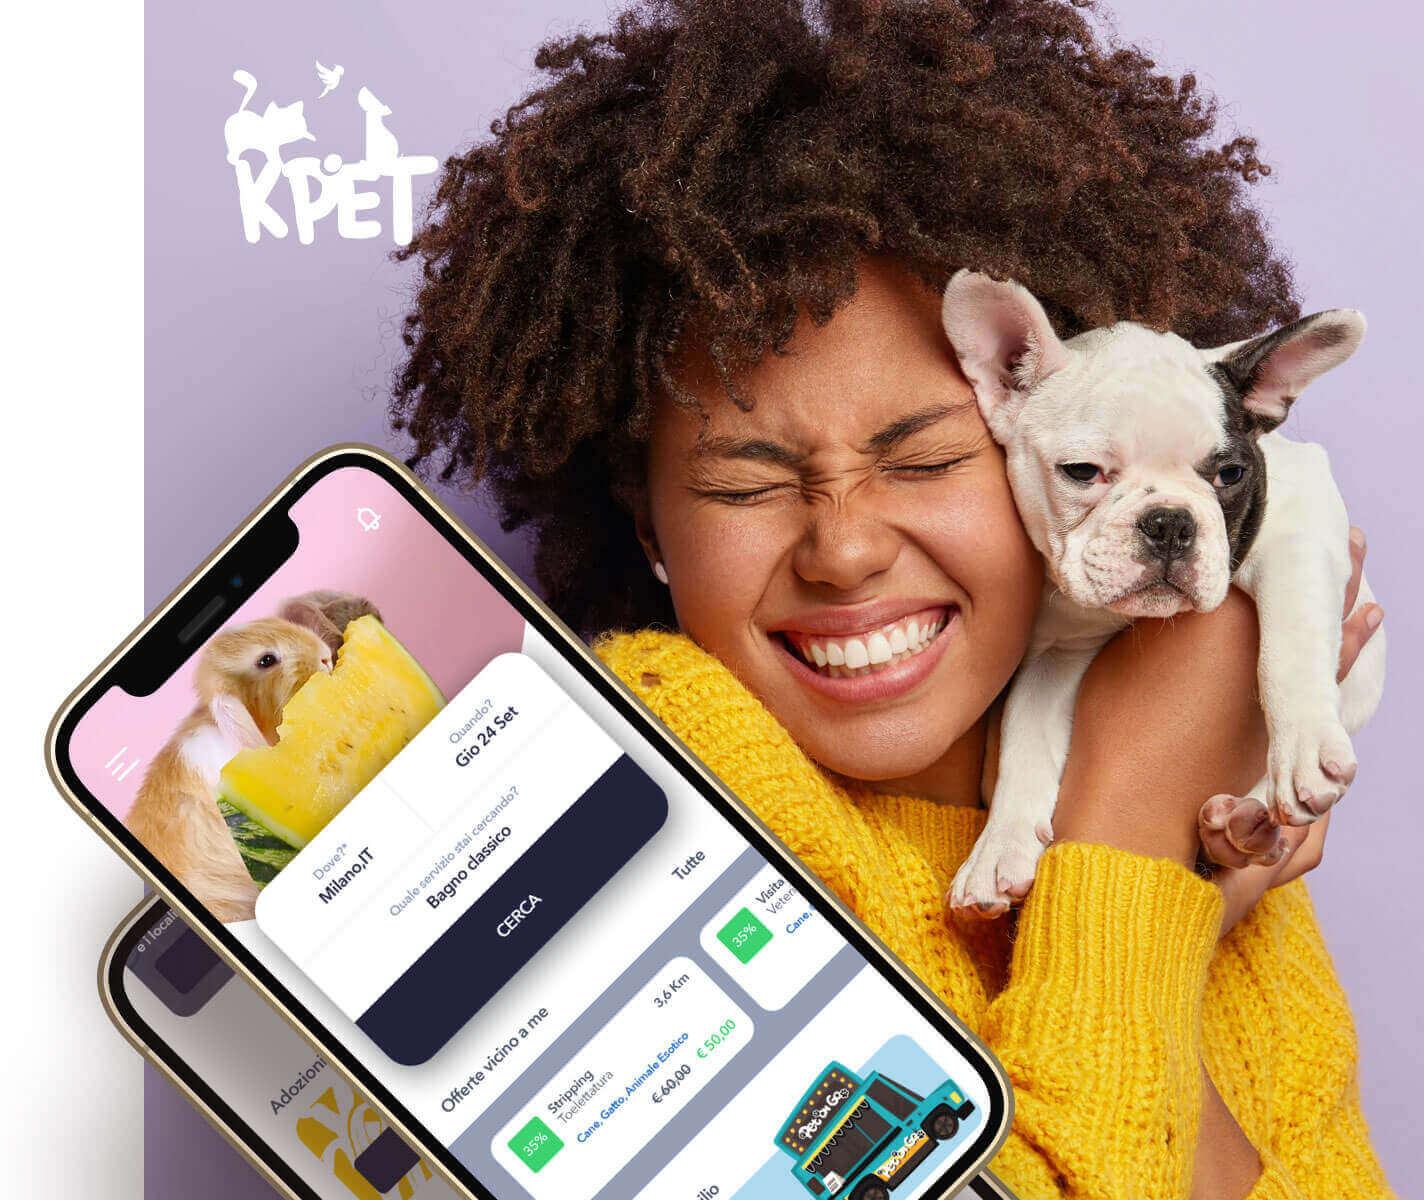 Kpet - booking app for petcare services - Carpediem srl